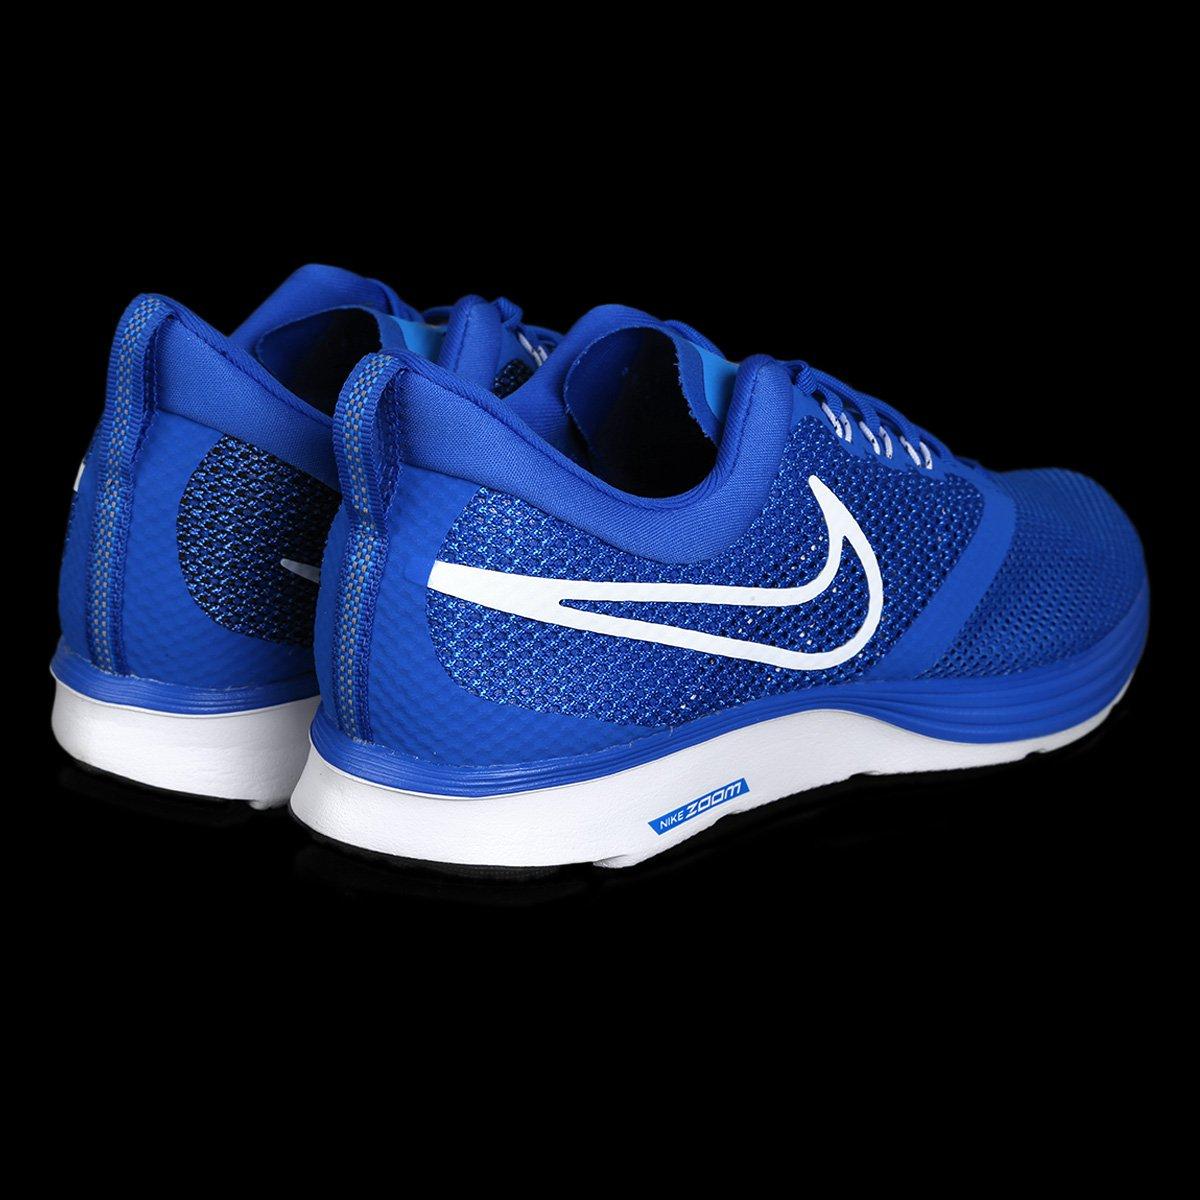 7369738215 Tênis Nike Zoom Strike Masculino - Azul e Branco - Compre Agora ...